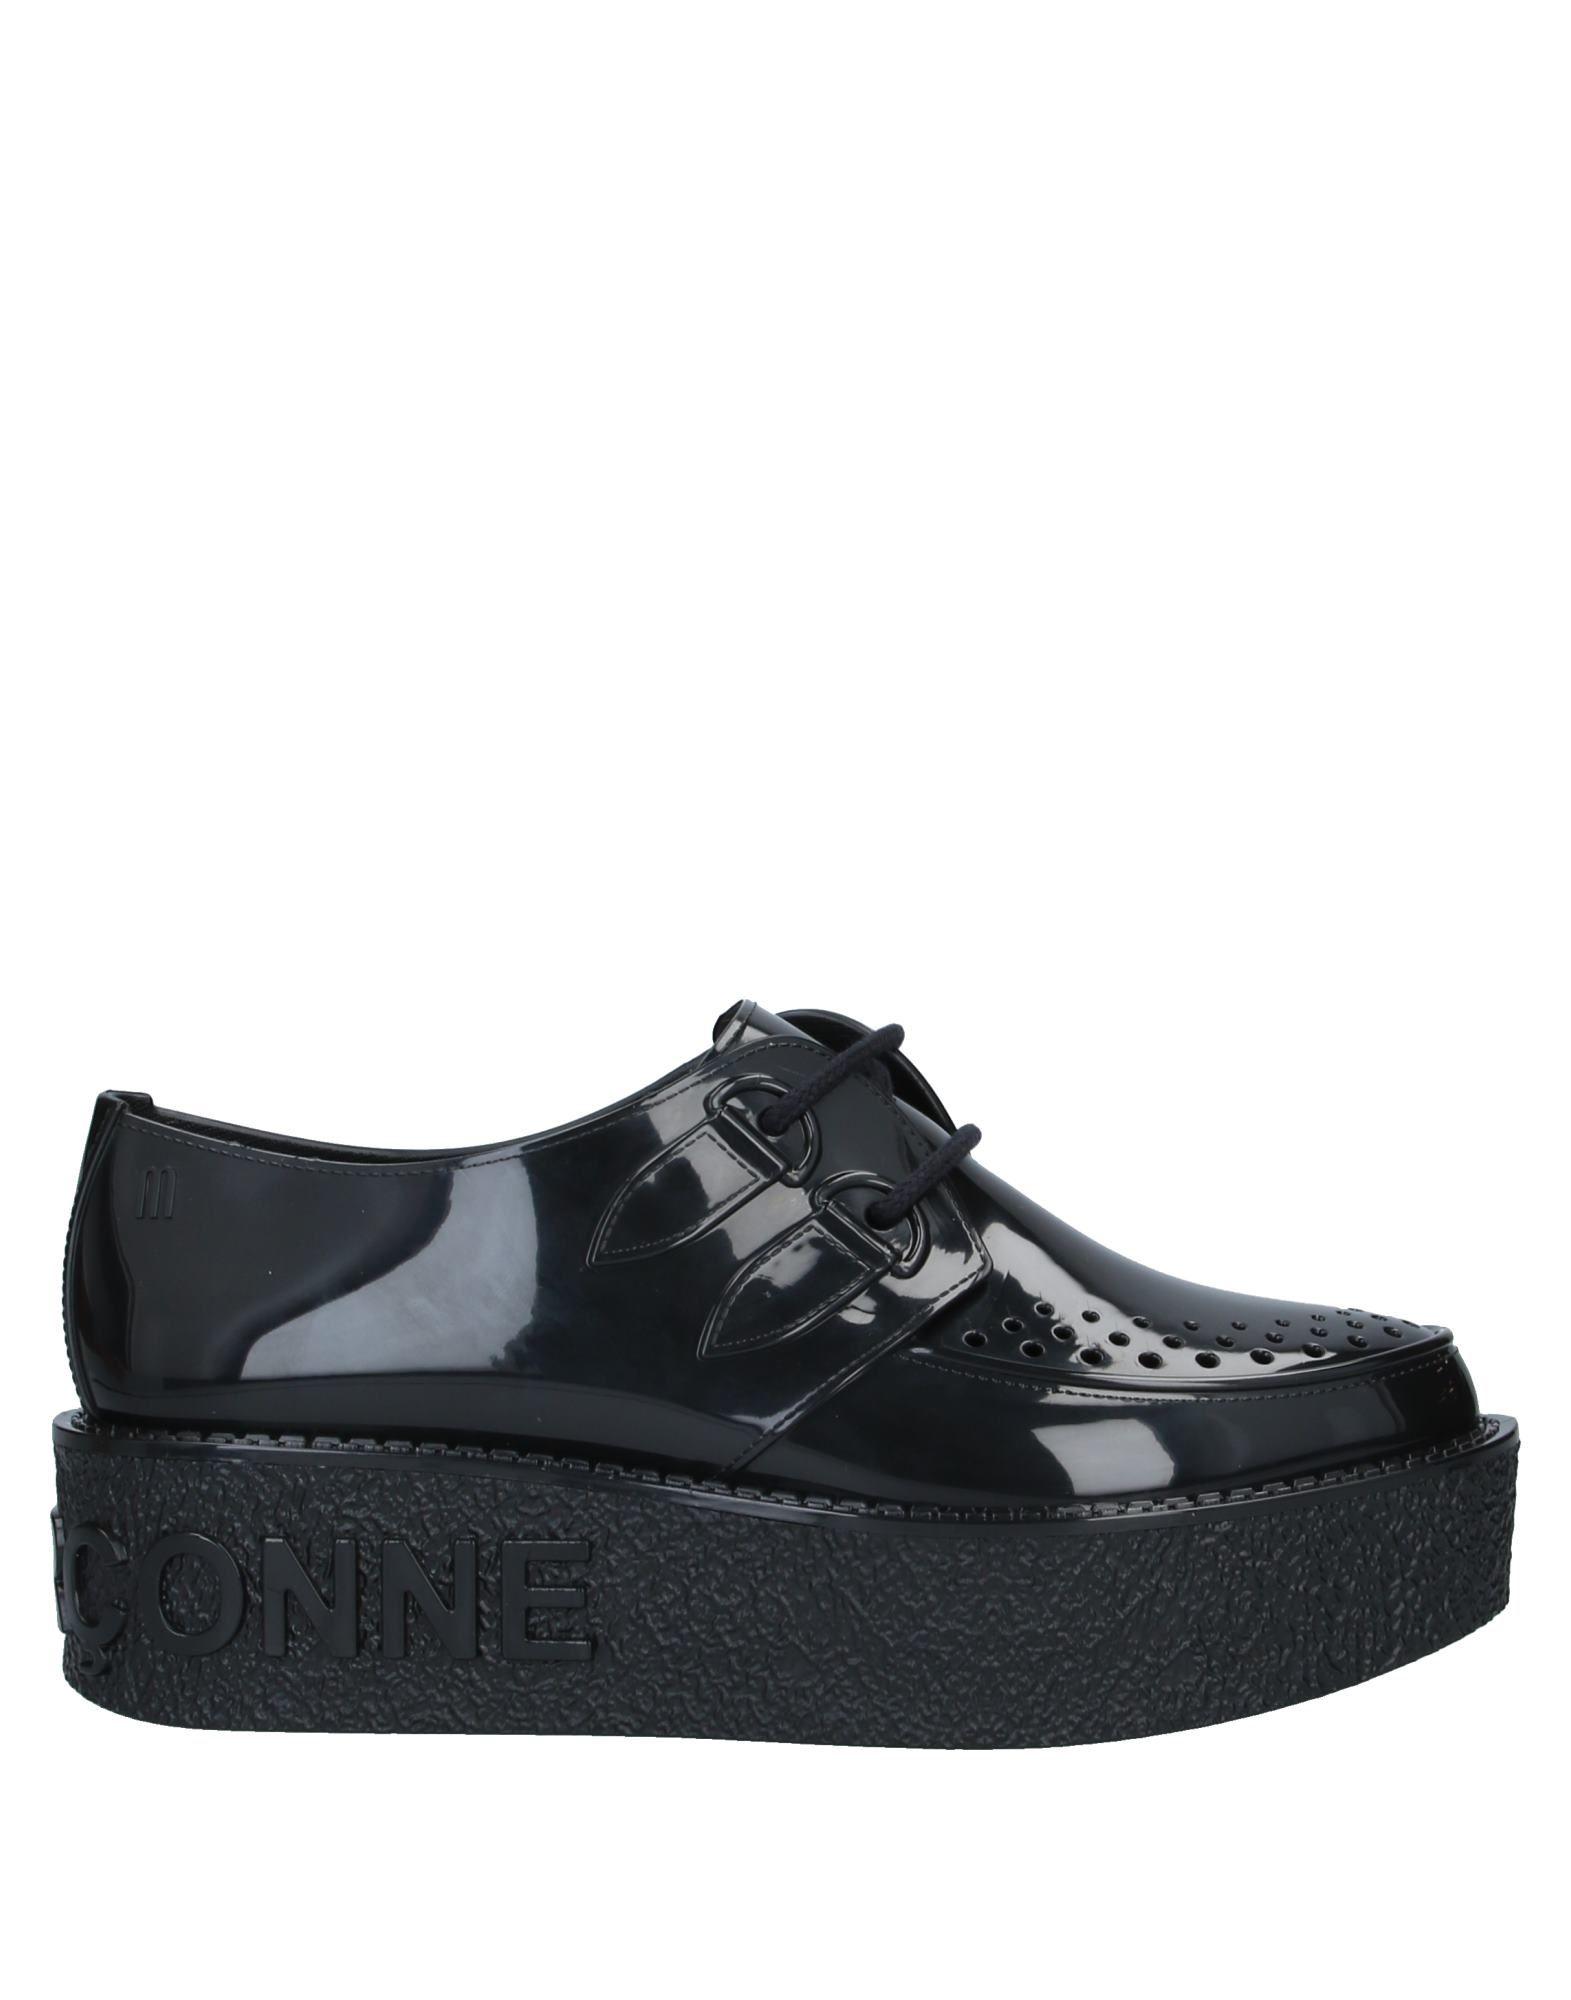 MELISSA / À LA GARÇONNE Обувь на шнурках